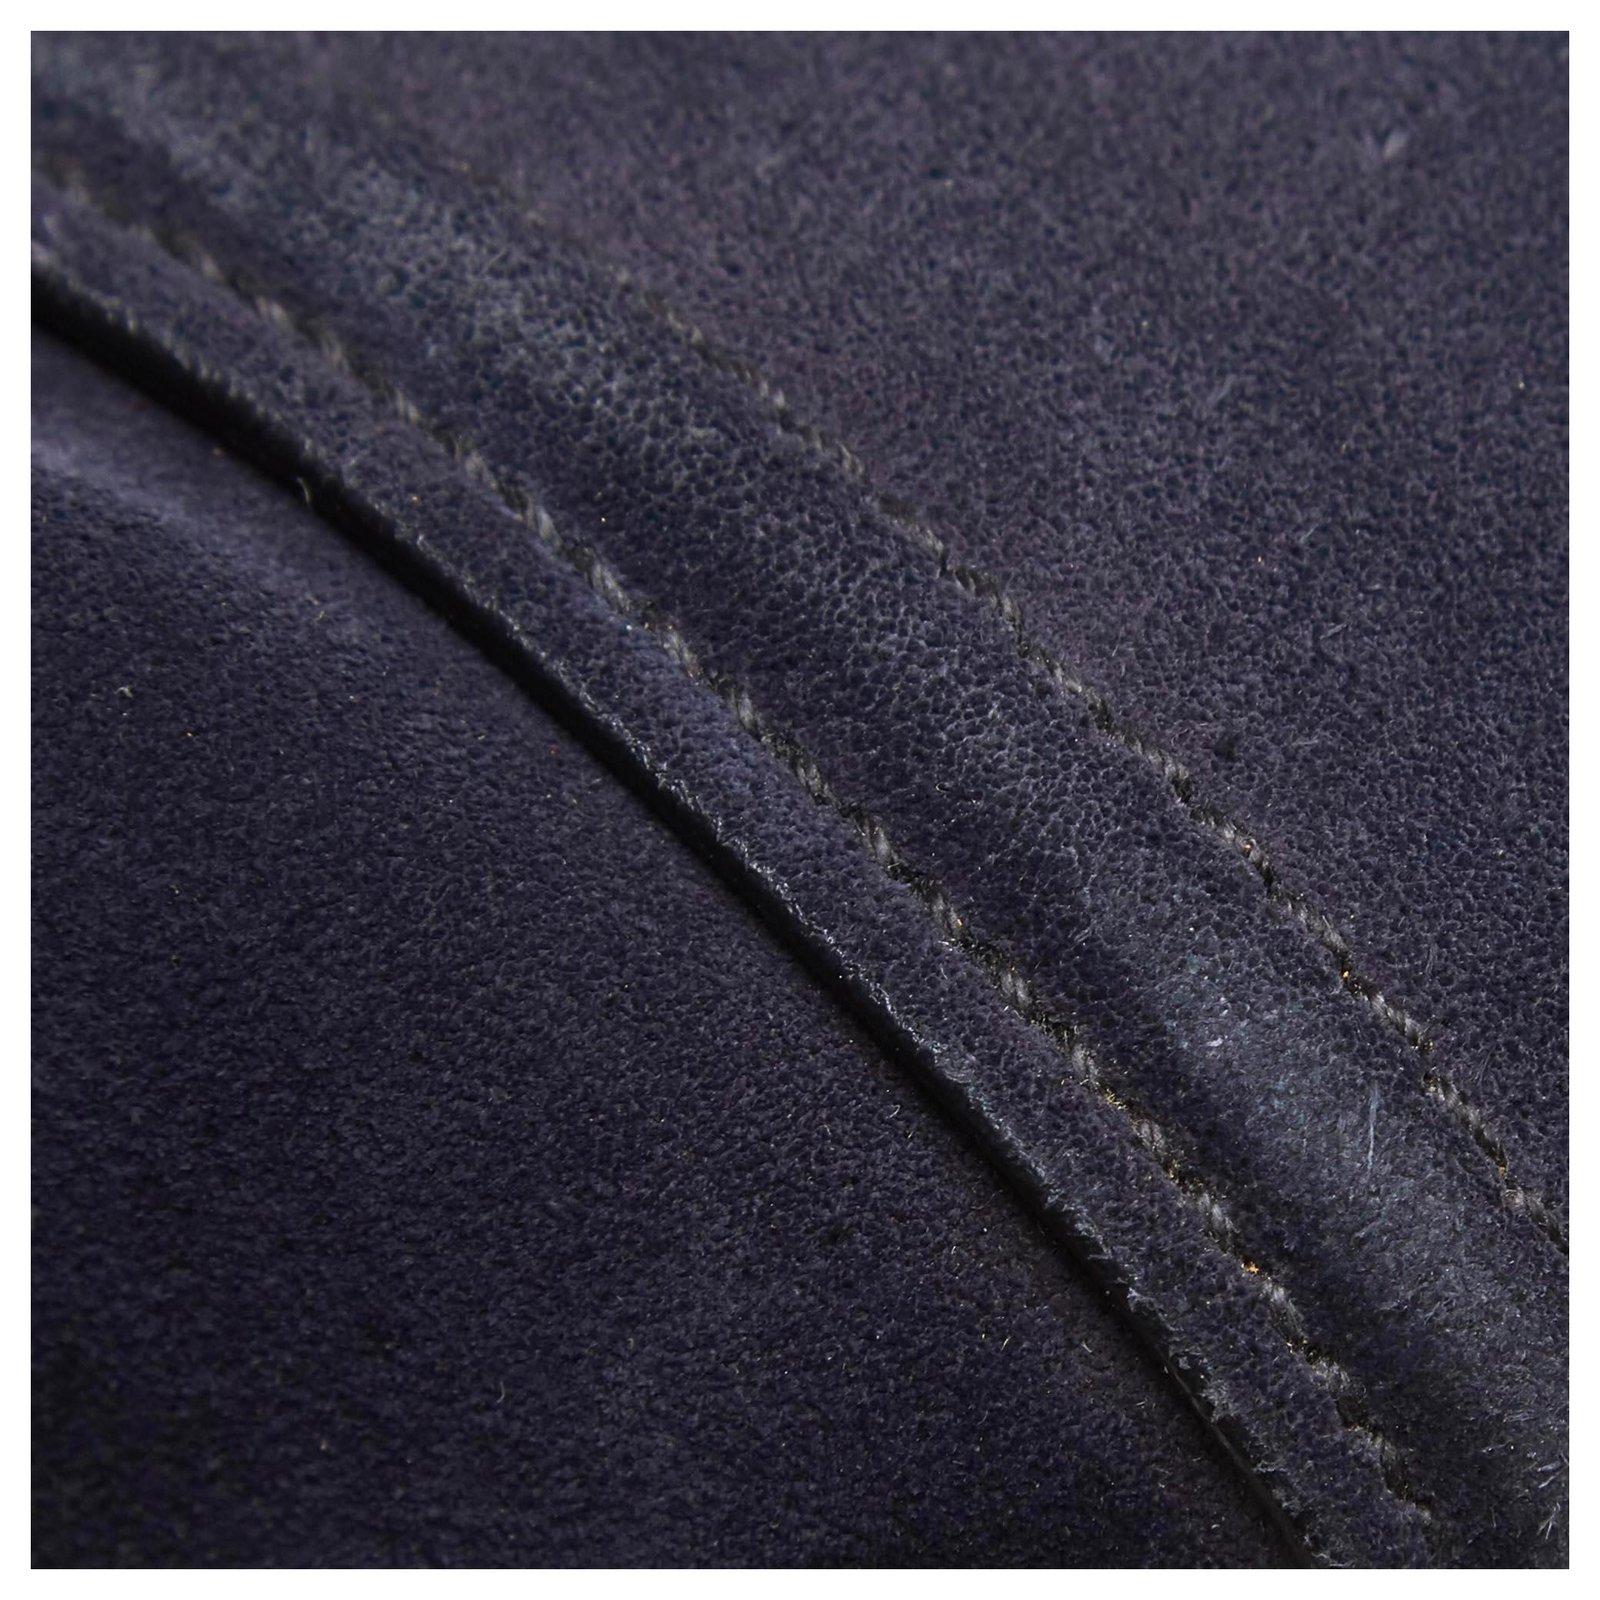 8c359451170b07 Prada Prada Blue Denim Twin Pocket Satchel Handbags Suede,Leather,Denim,Cloth  Blue,Navy blue ref.123987 - Joli Closet